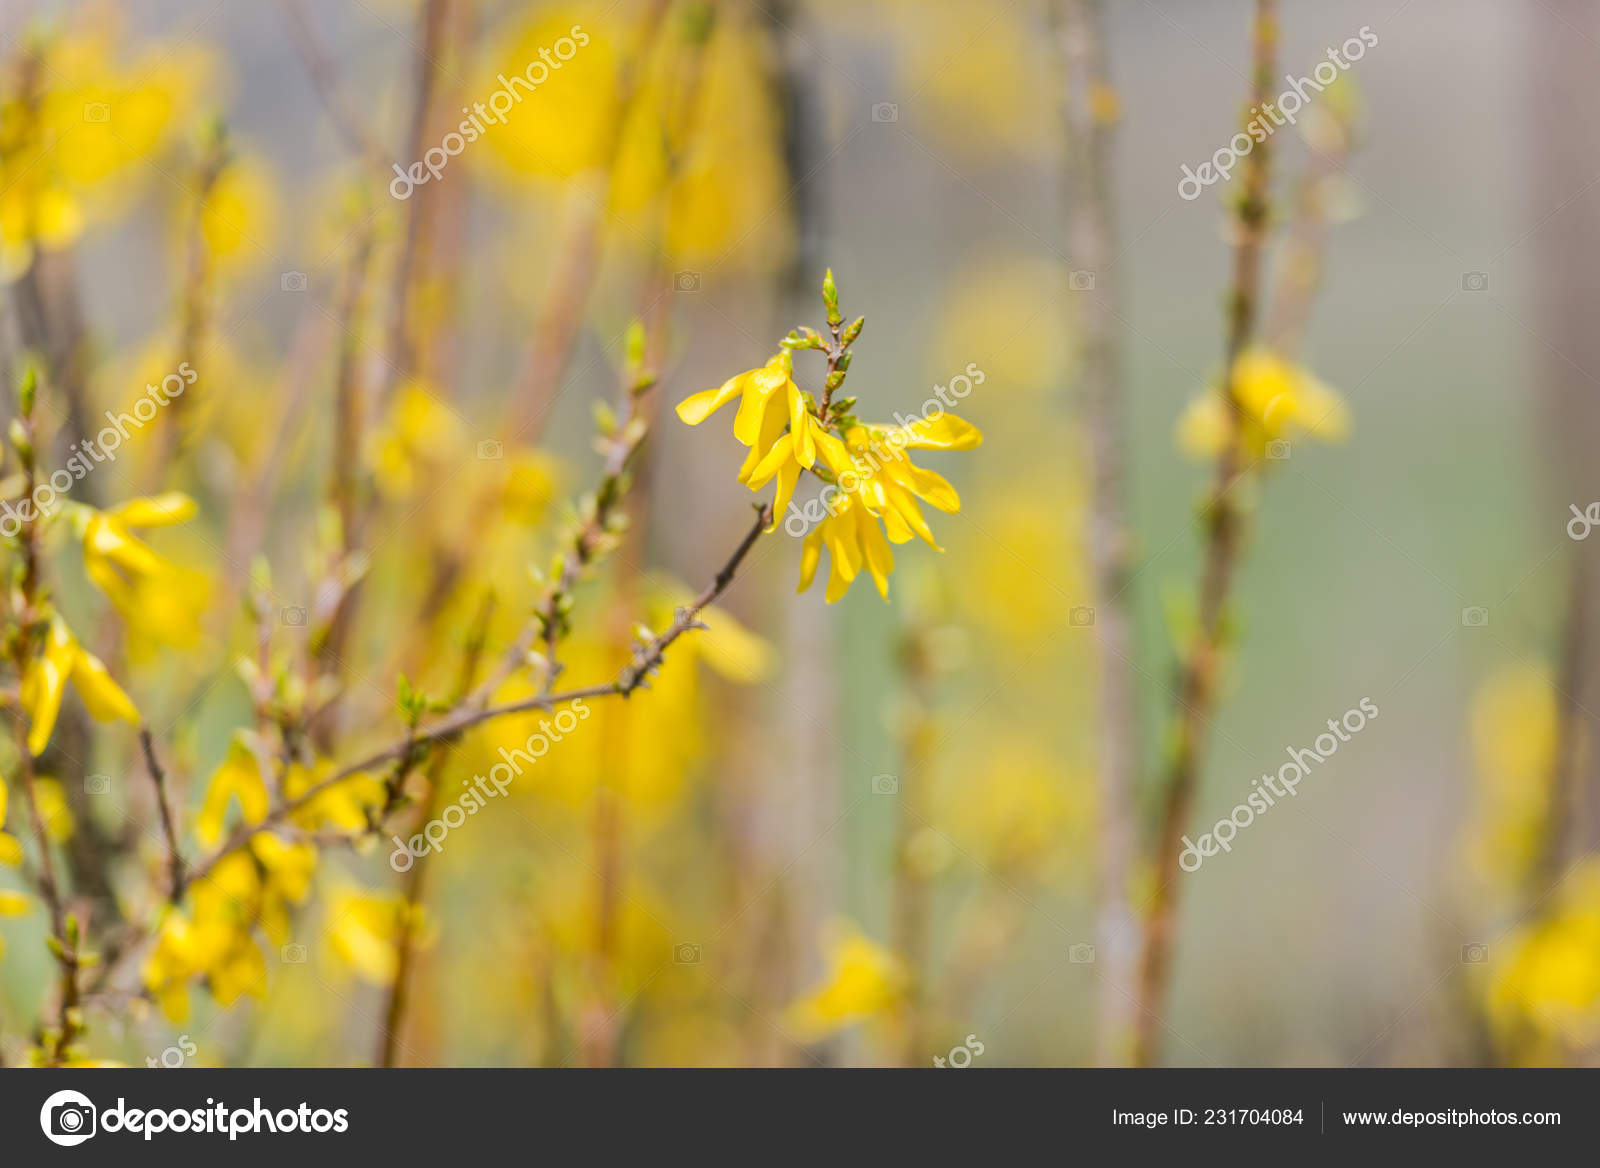 Spring Garden Blooming Yellow Bushes Stock Photo C Somra Stefan